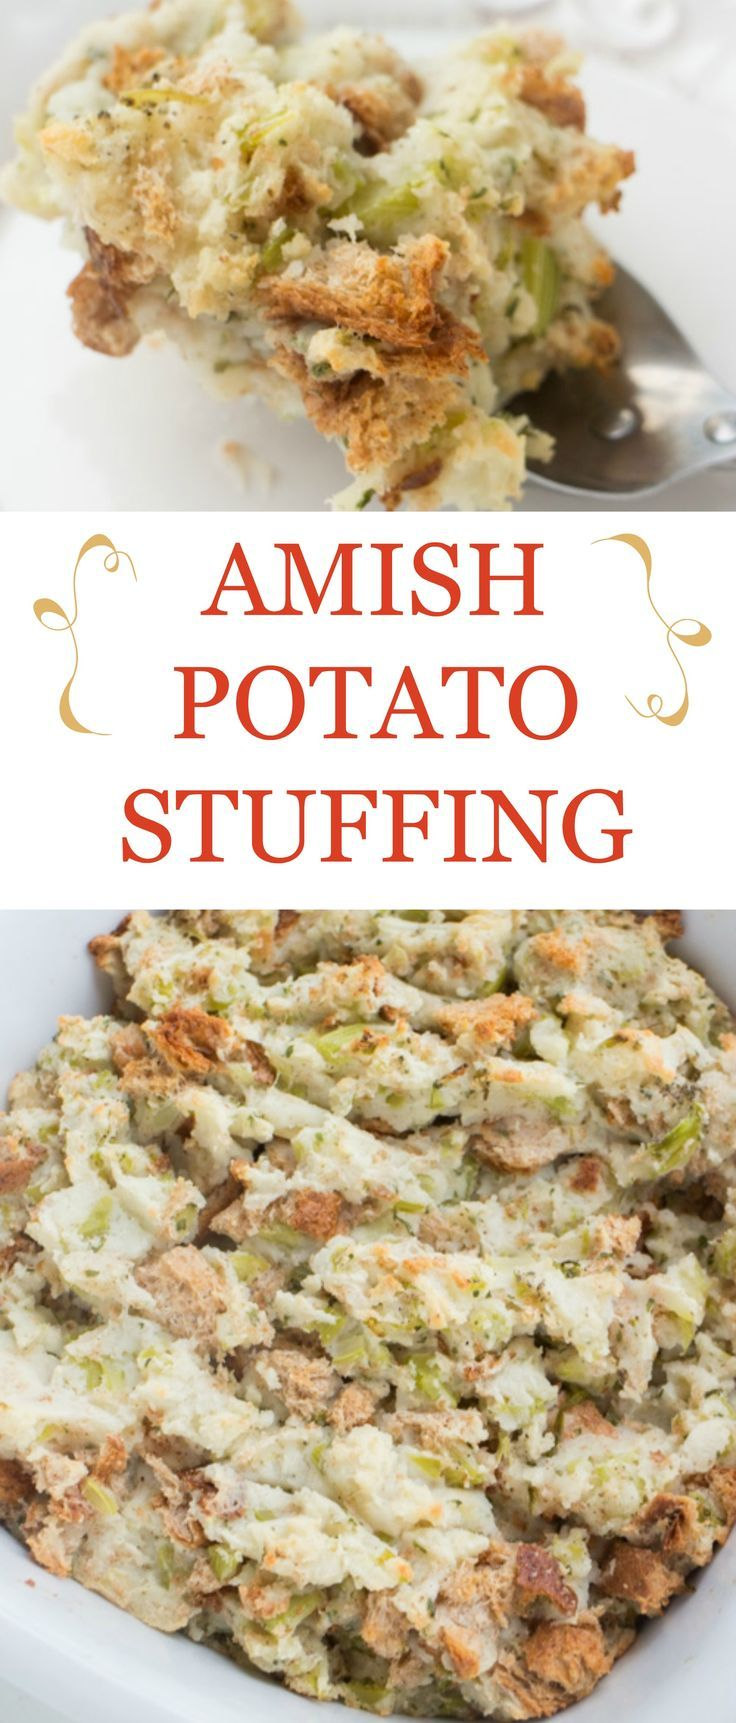 Amish Potato Stuffing : brooklynfarmgirl